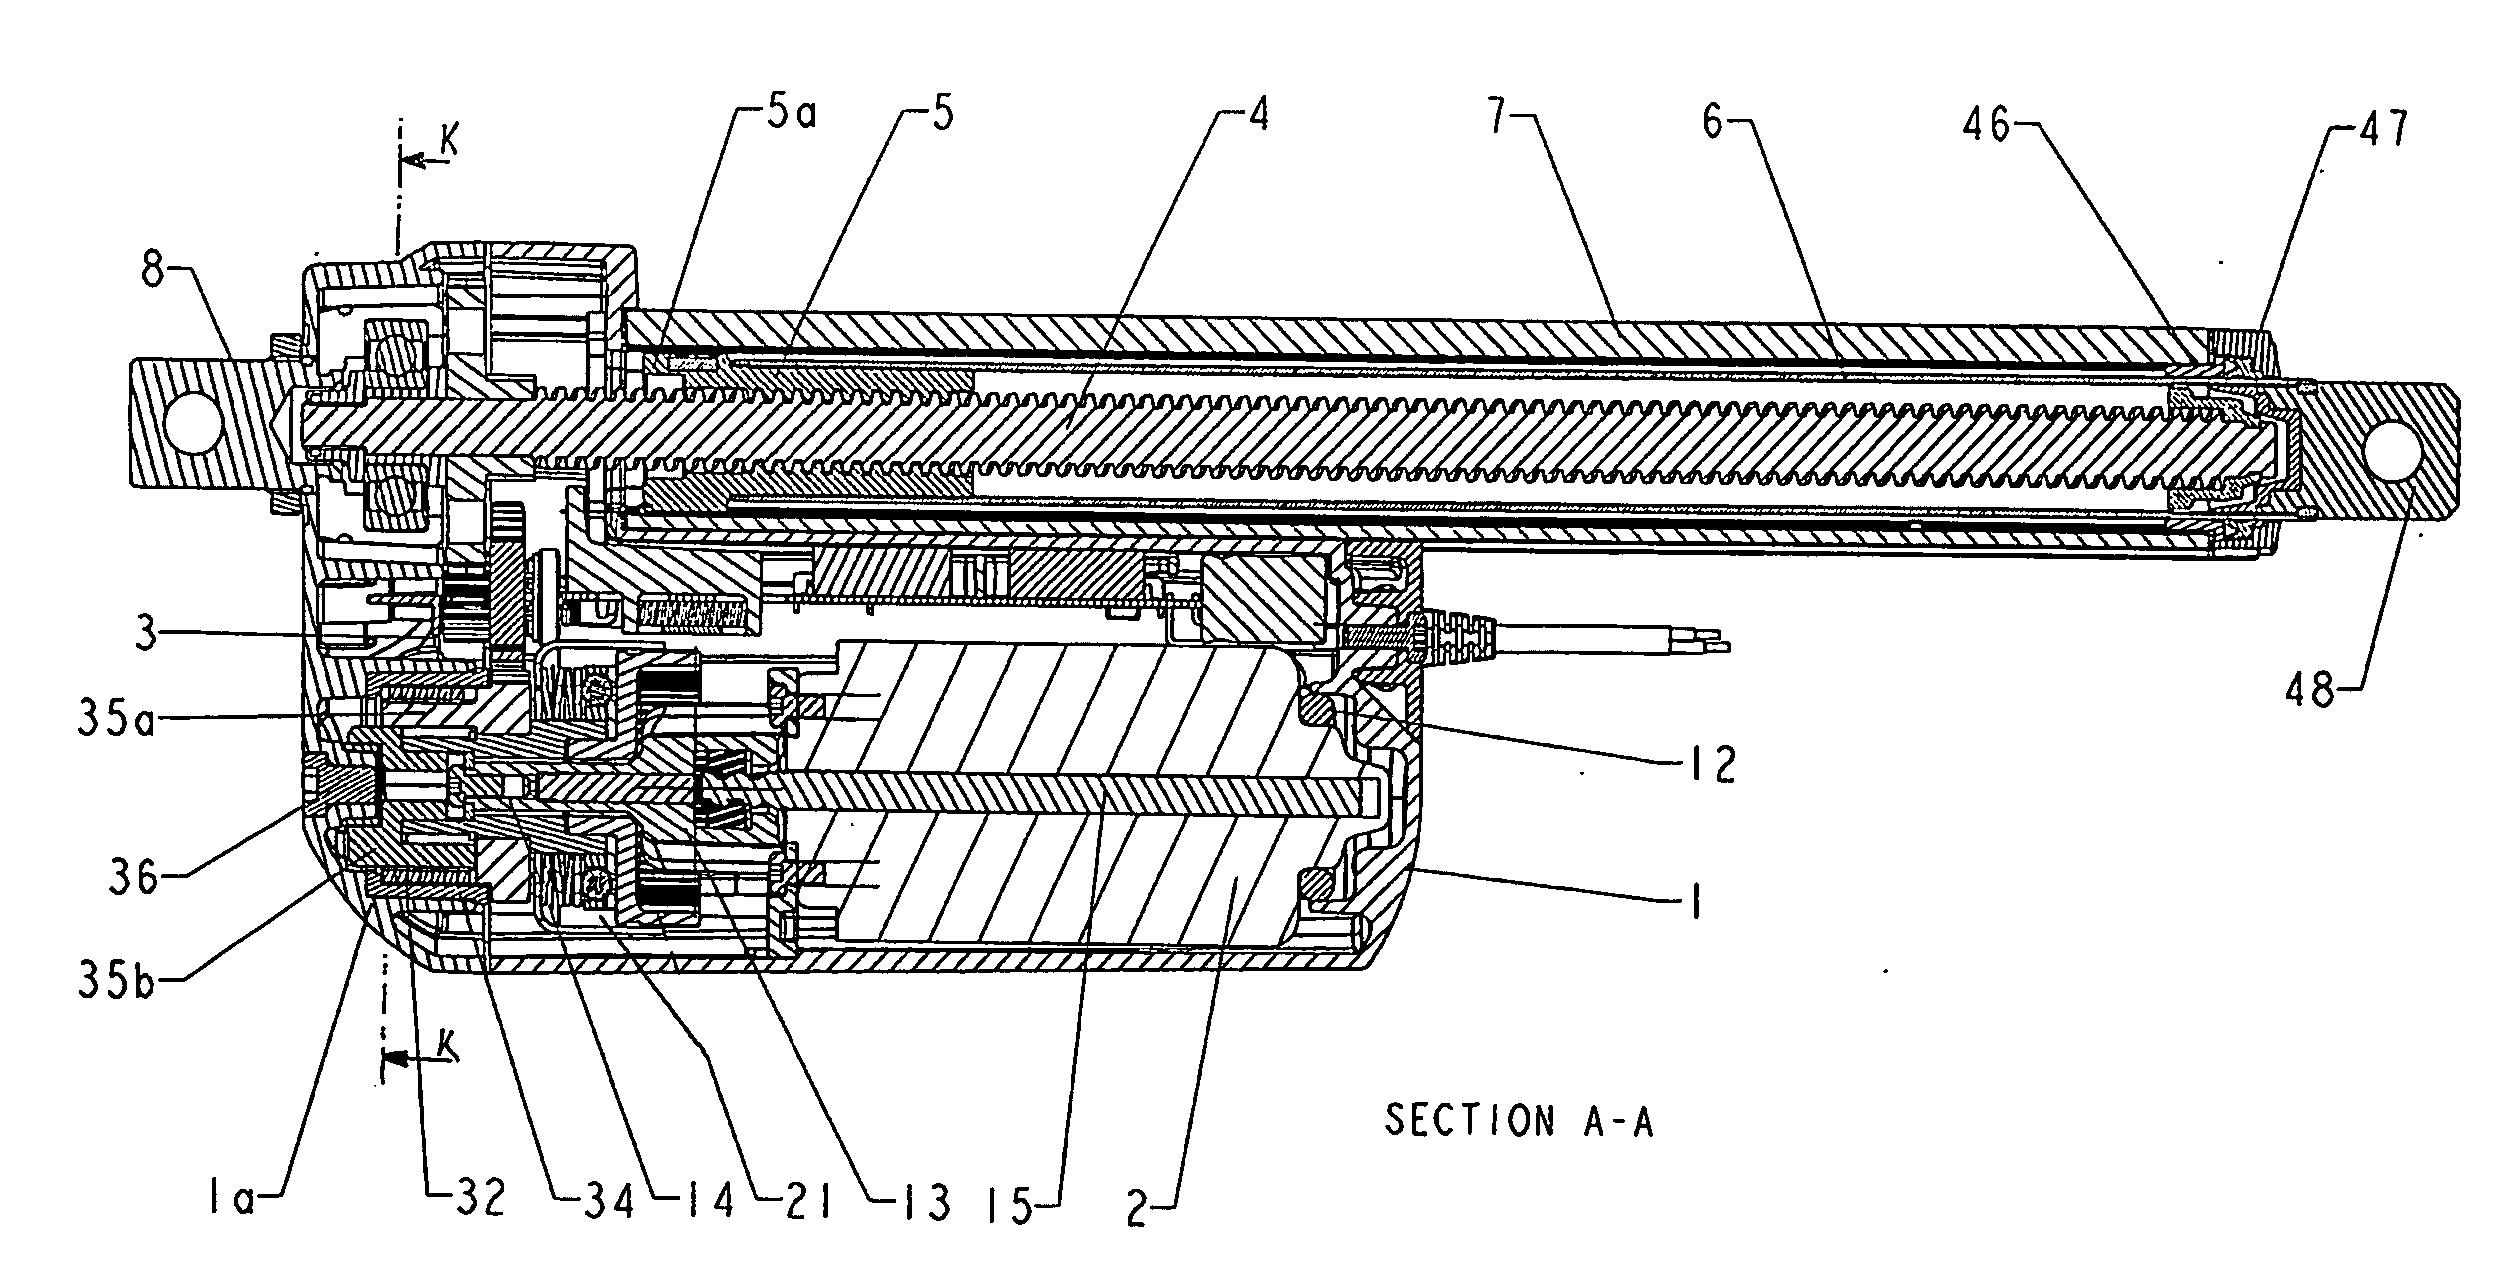 linak linear actuator wiring diagram wiring diagram Linear Actuator Battery wrg 5624] linak linear actuator wiring diagrampatent us20070169578 linear actuator google patentsuche patent drawing linak